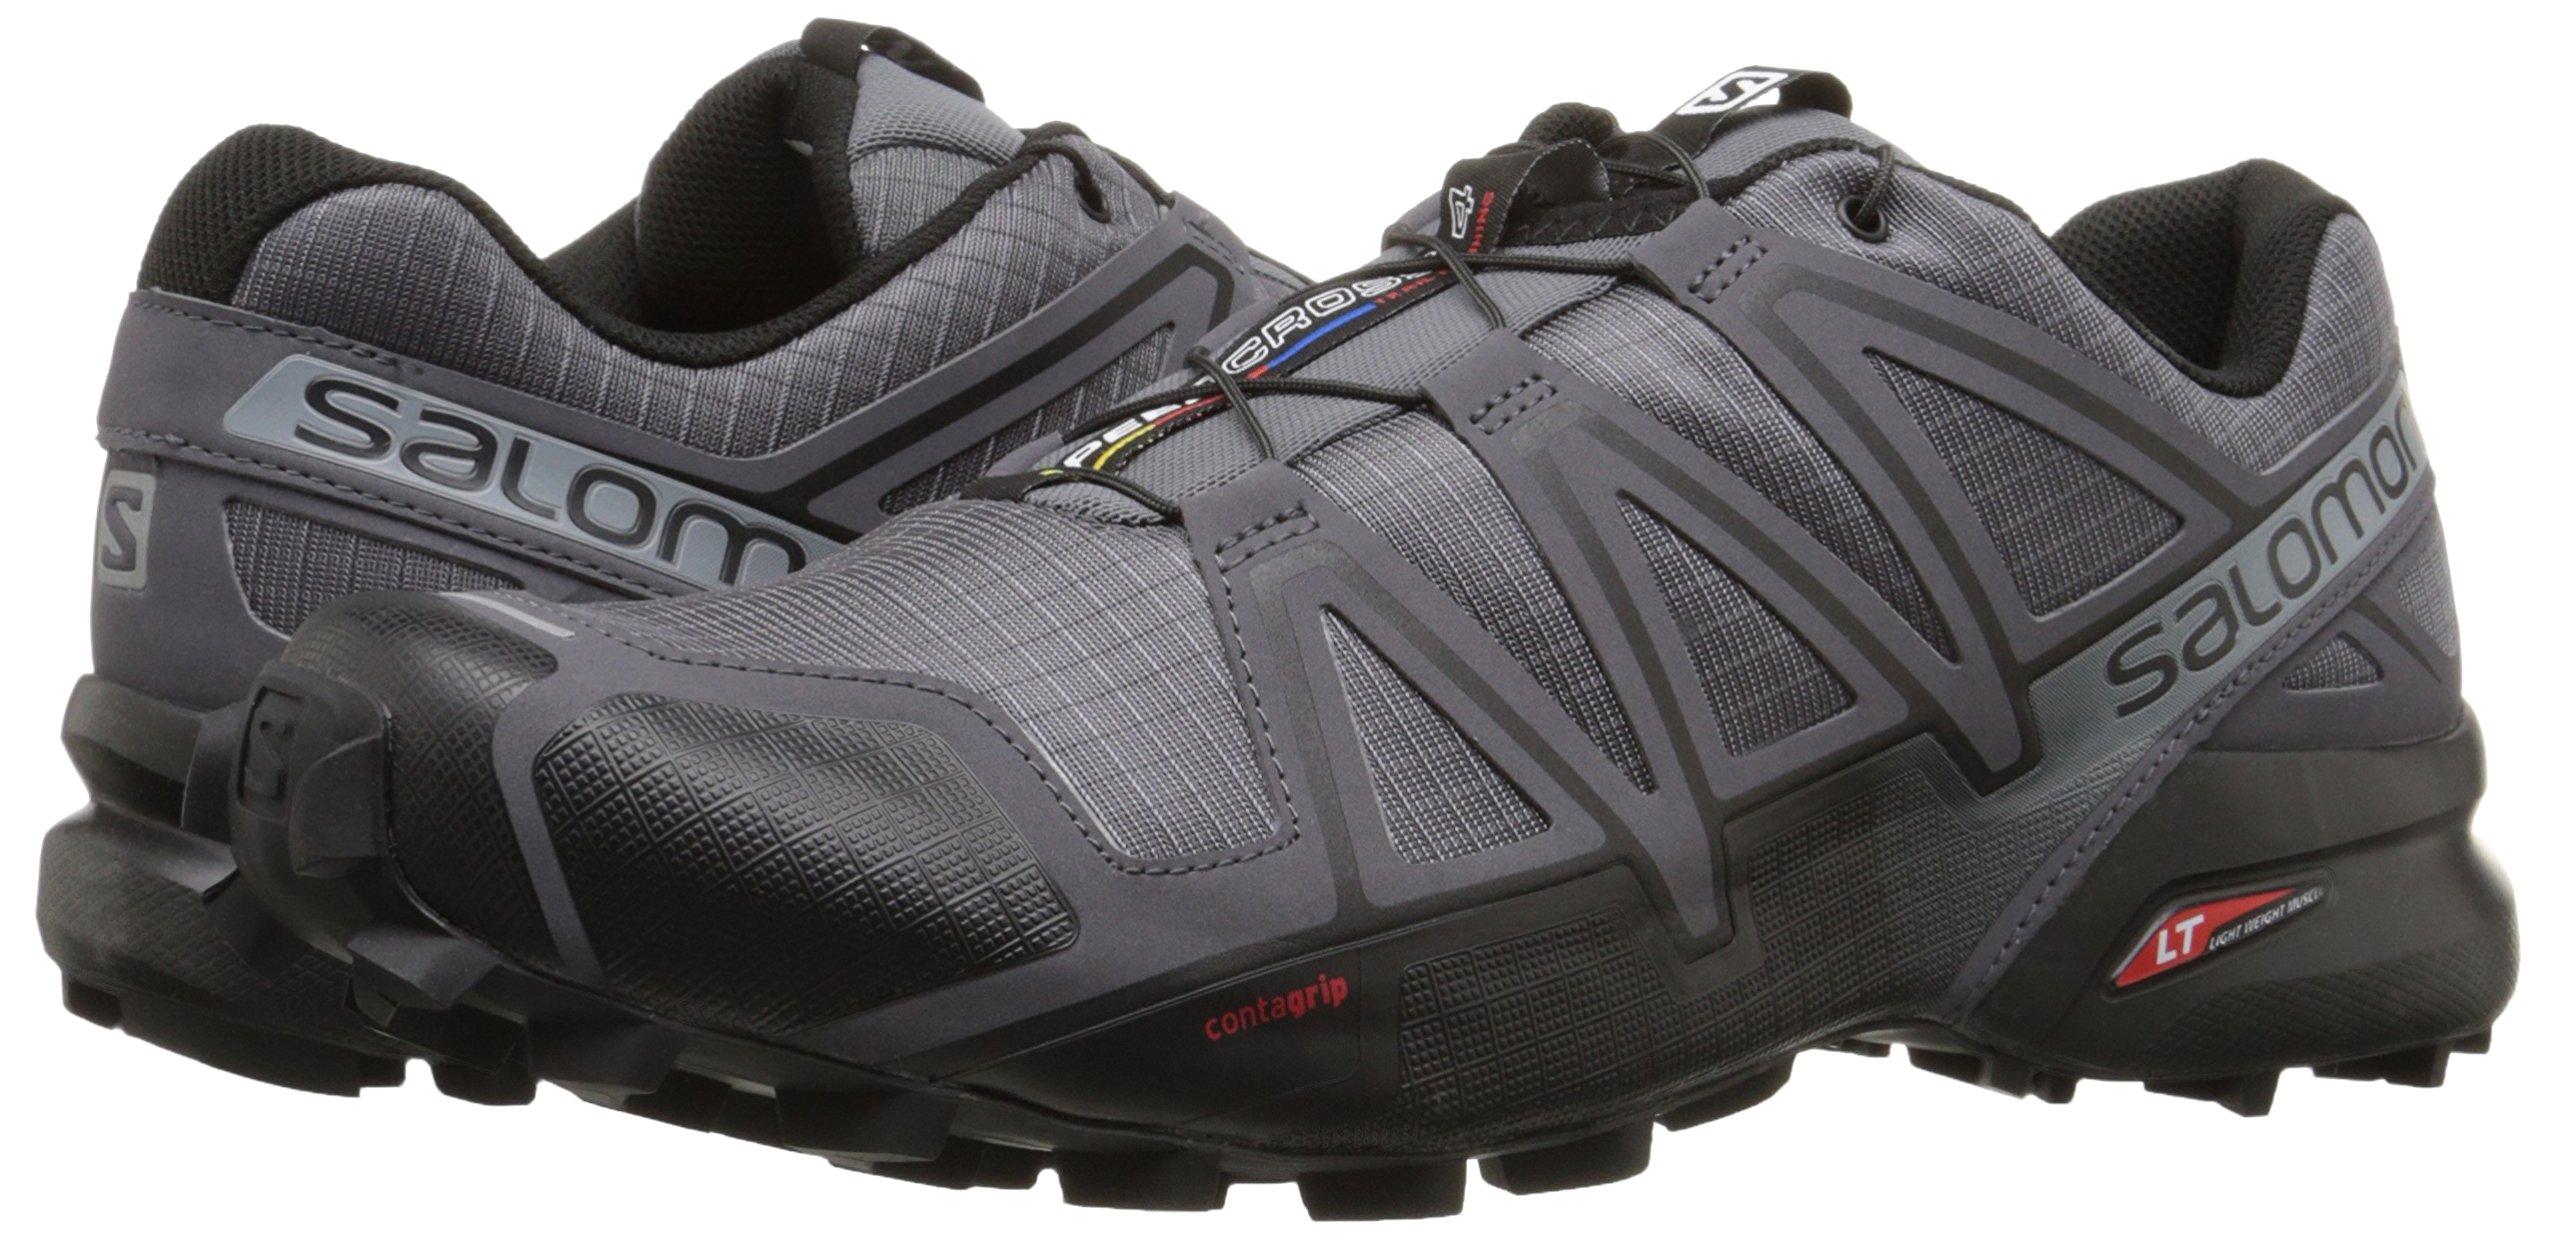 Salomon Men's Speedcross 4 Trail Runner, Dark Cloud, 7 M US by Salomon (Image #7)